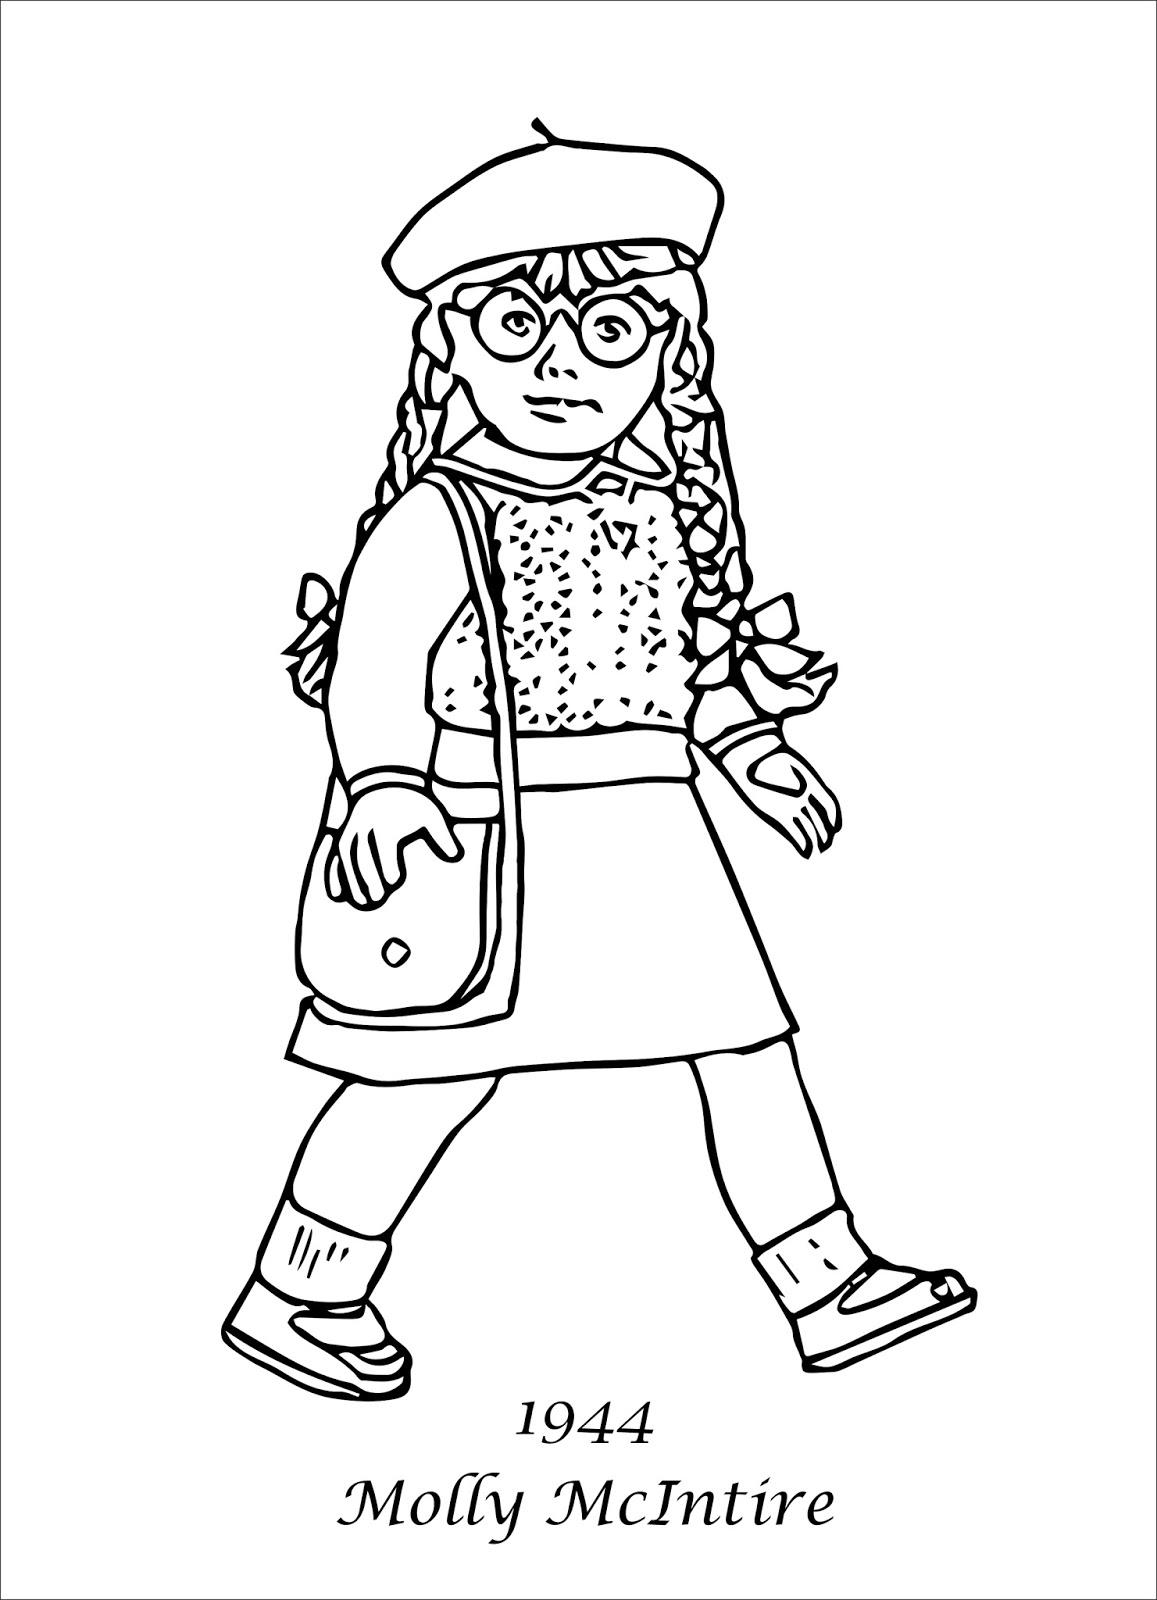 Molly Mcintire American Girl Logo